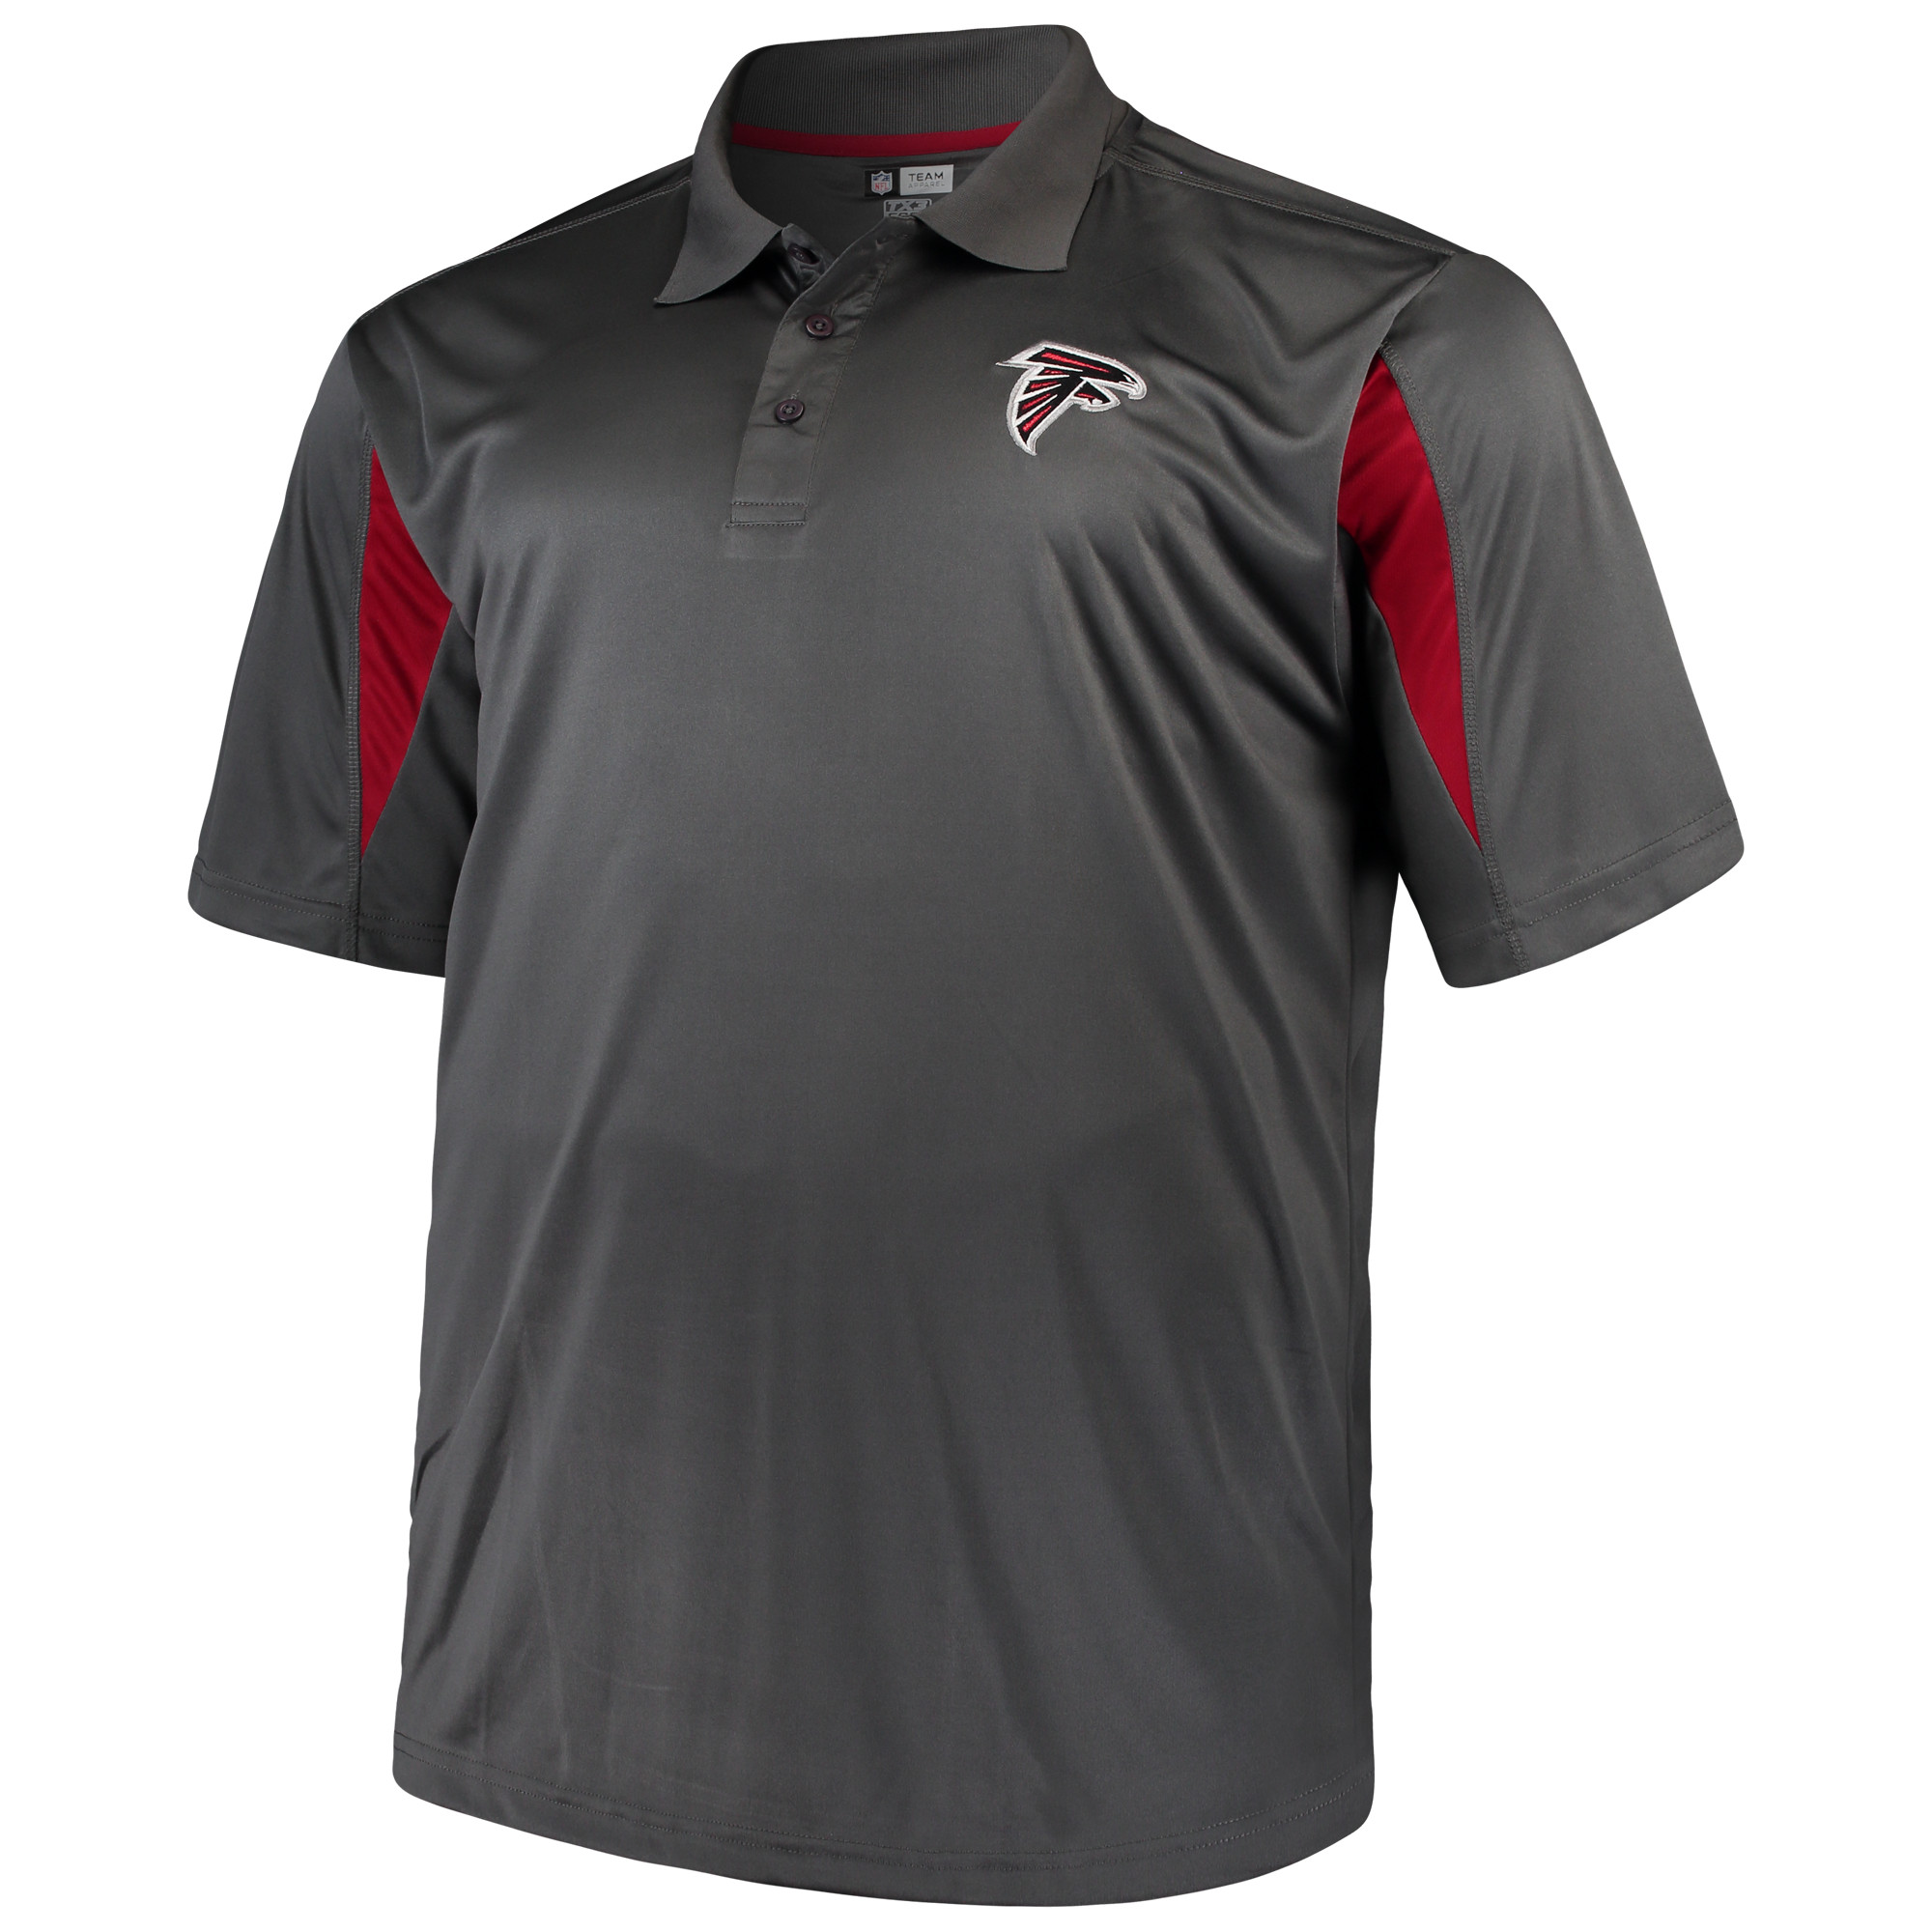 Men's Majestic Charcoal Atlanta Falcons Big & Tall Pieced Polo